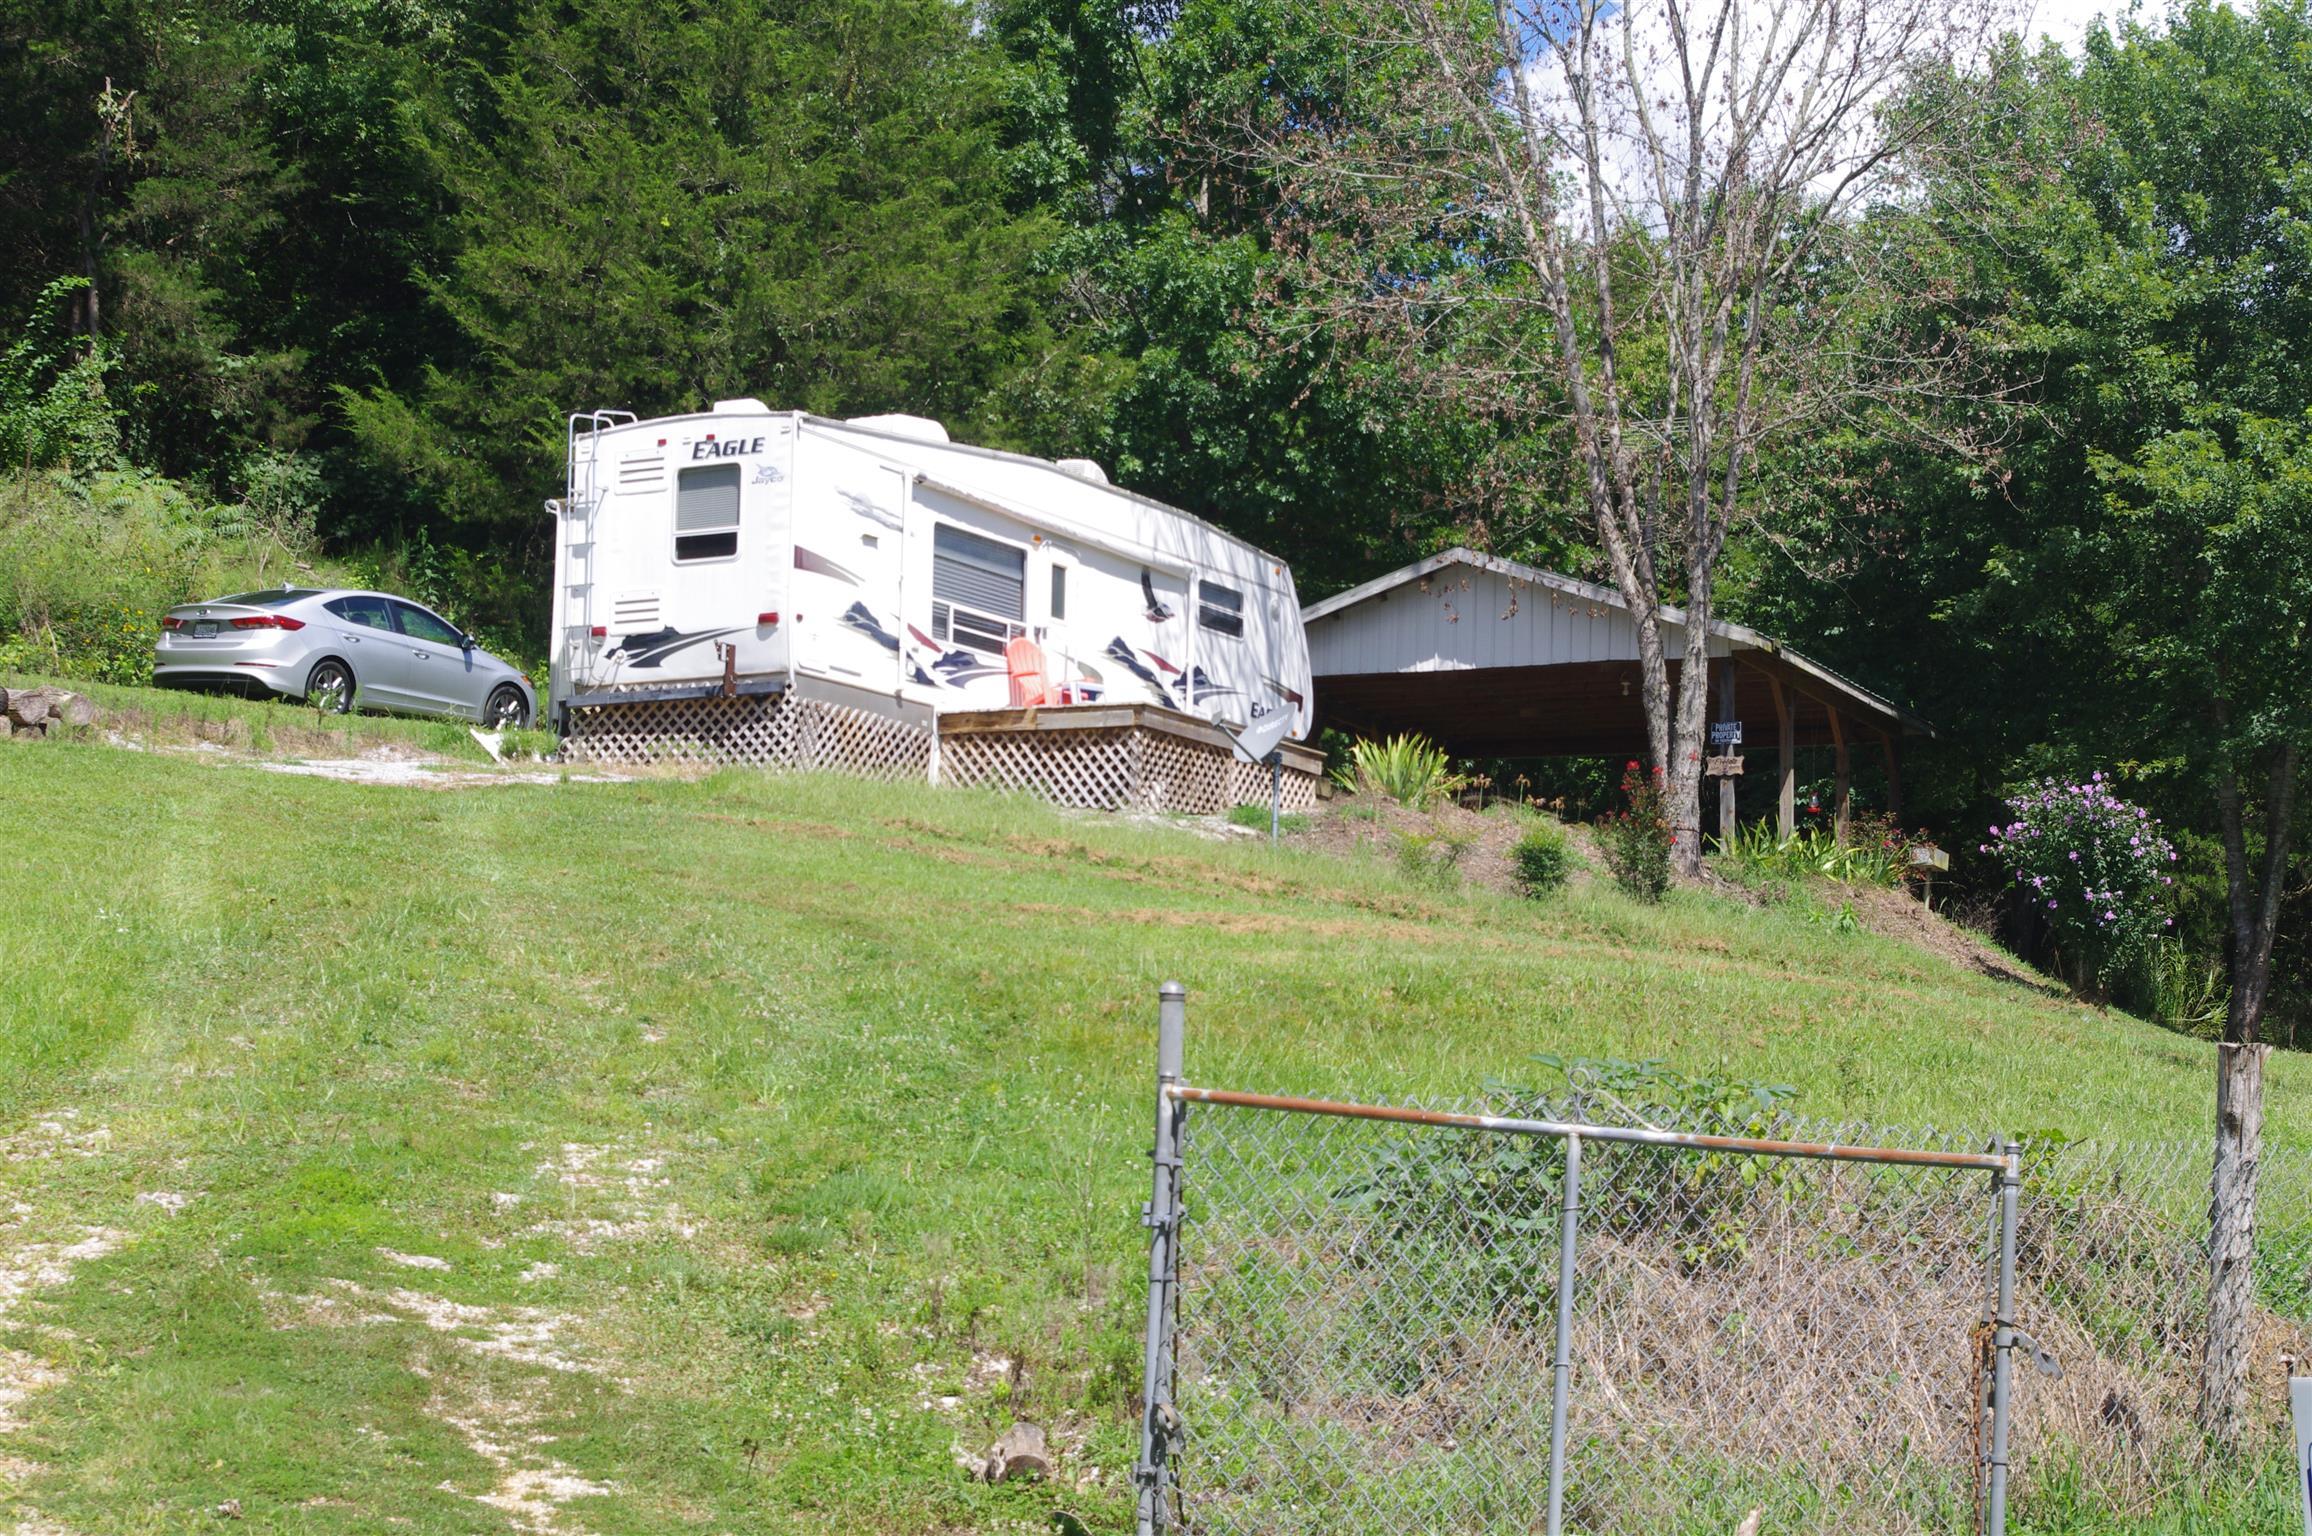 291 Enigma Rd, Chestnut Mound, TN 38552 - Chestnut Mound, TN real estate listing